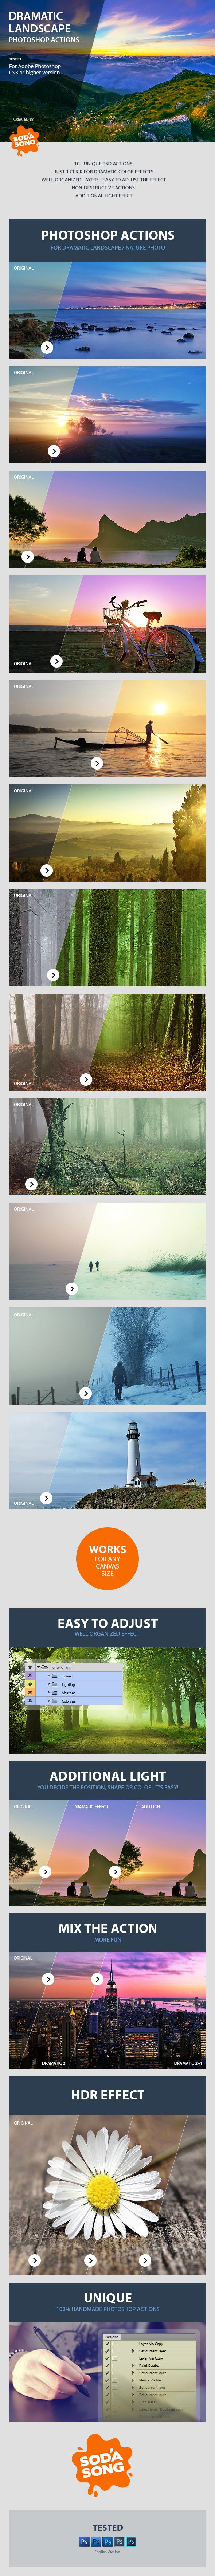 PS动作,诱人的戏剧性风景 Dramatic Landscape Photoshop Actions - Photo Effects...ps动作下载,预览图2